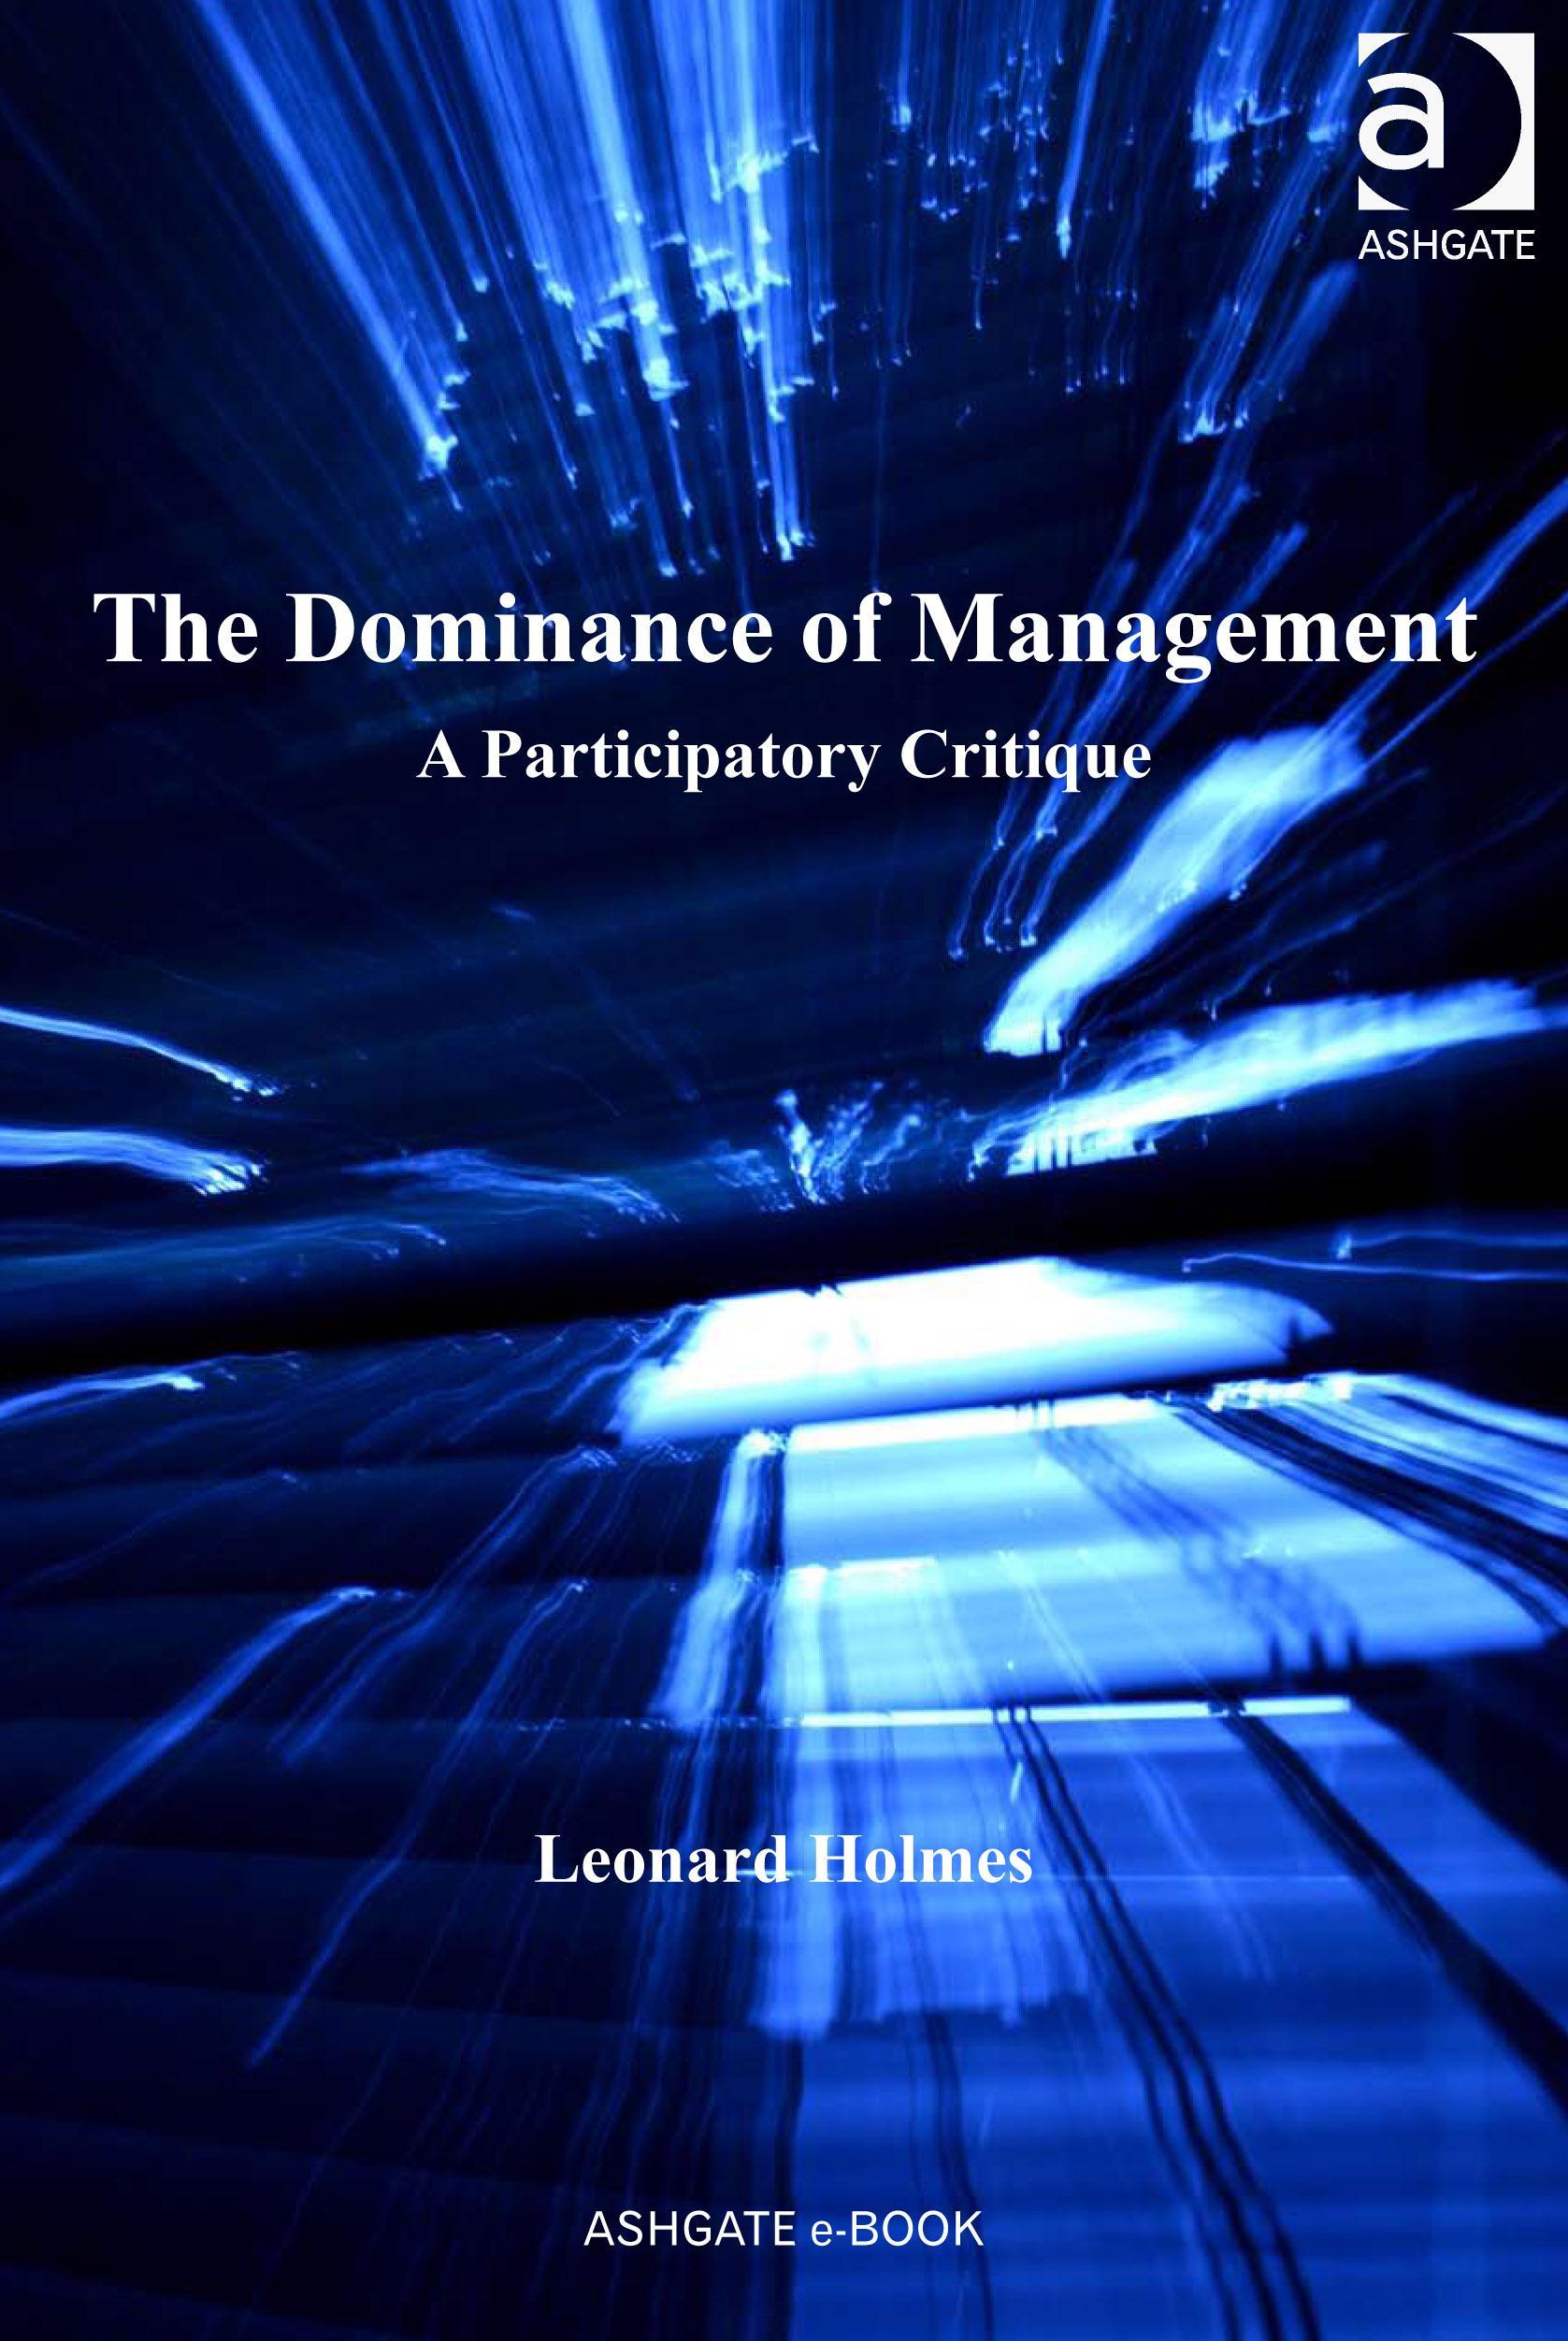 The Dominance of Management: A Participatory Critique EB9781409410478